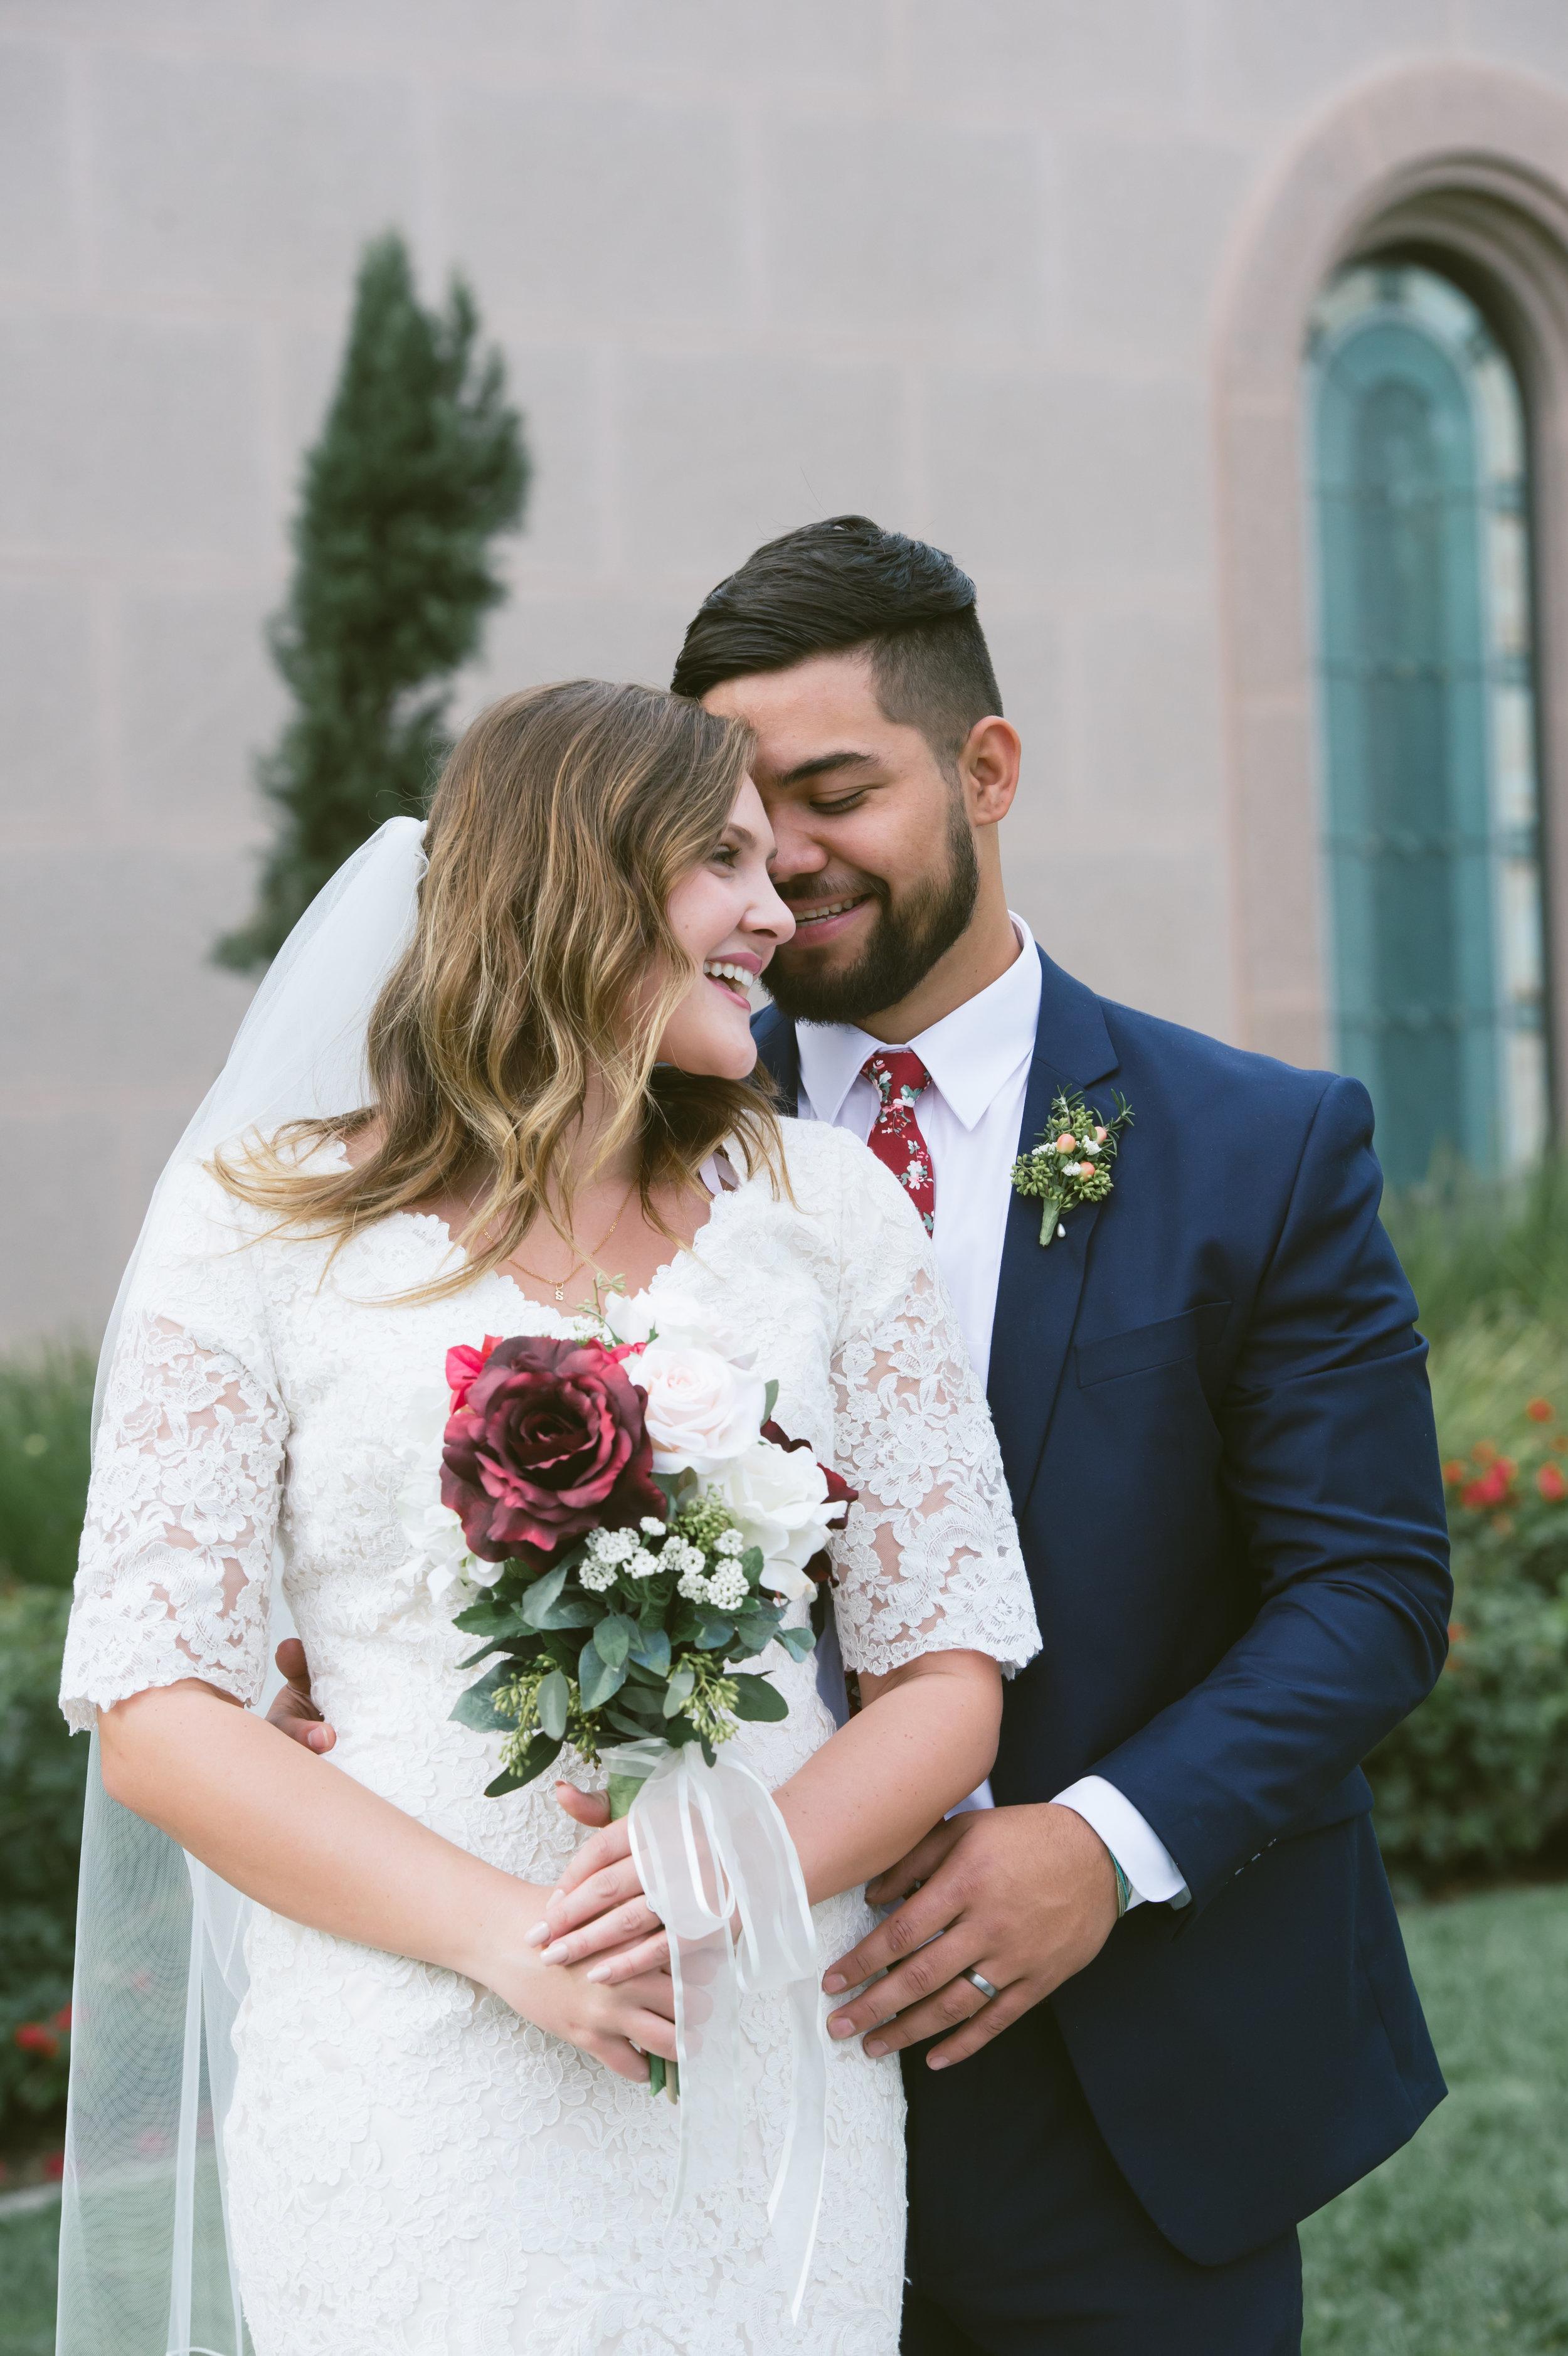 10Newport Beach LDS Temple Wedding Pictures.jpg